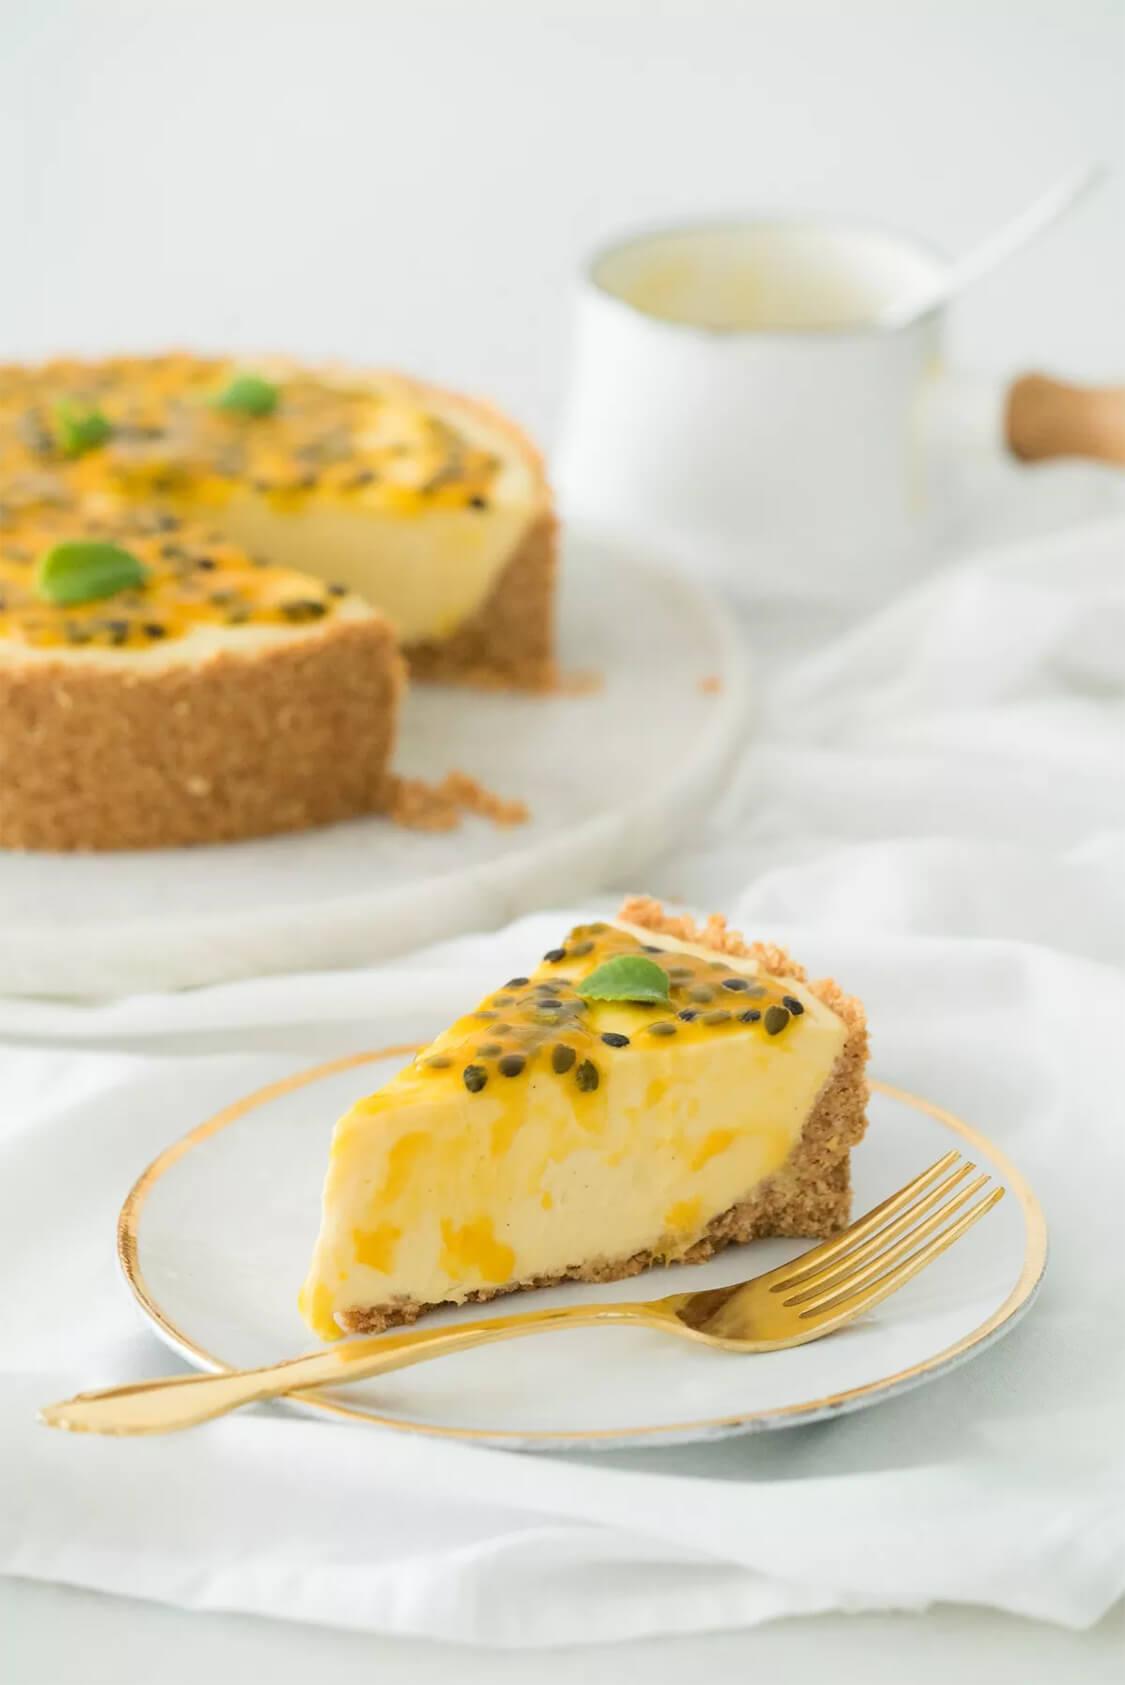 cheesecake de maracuja